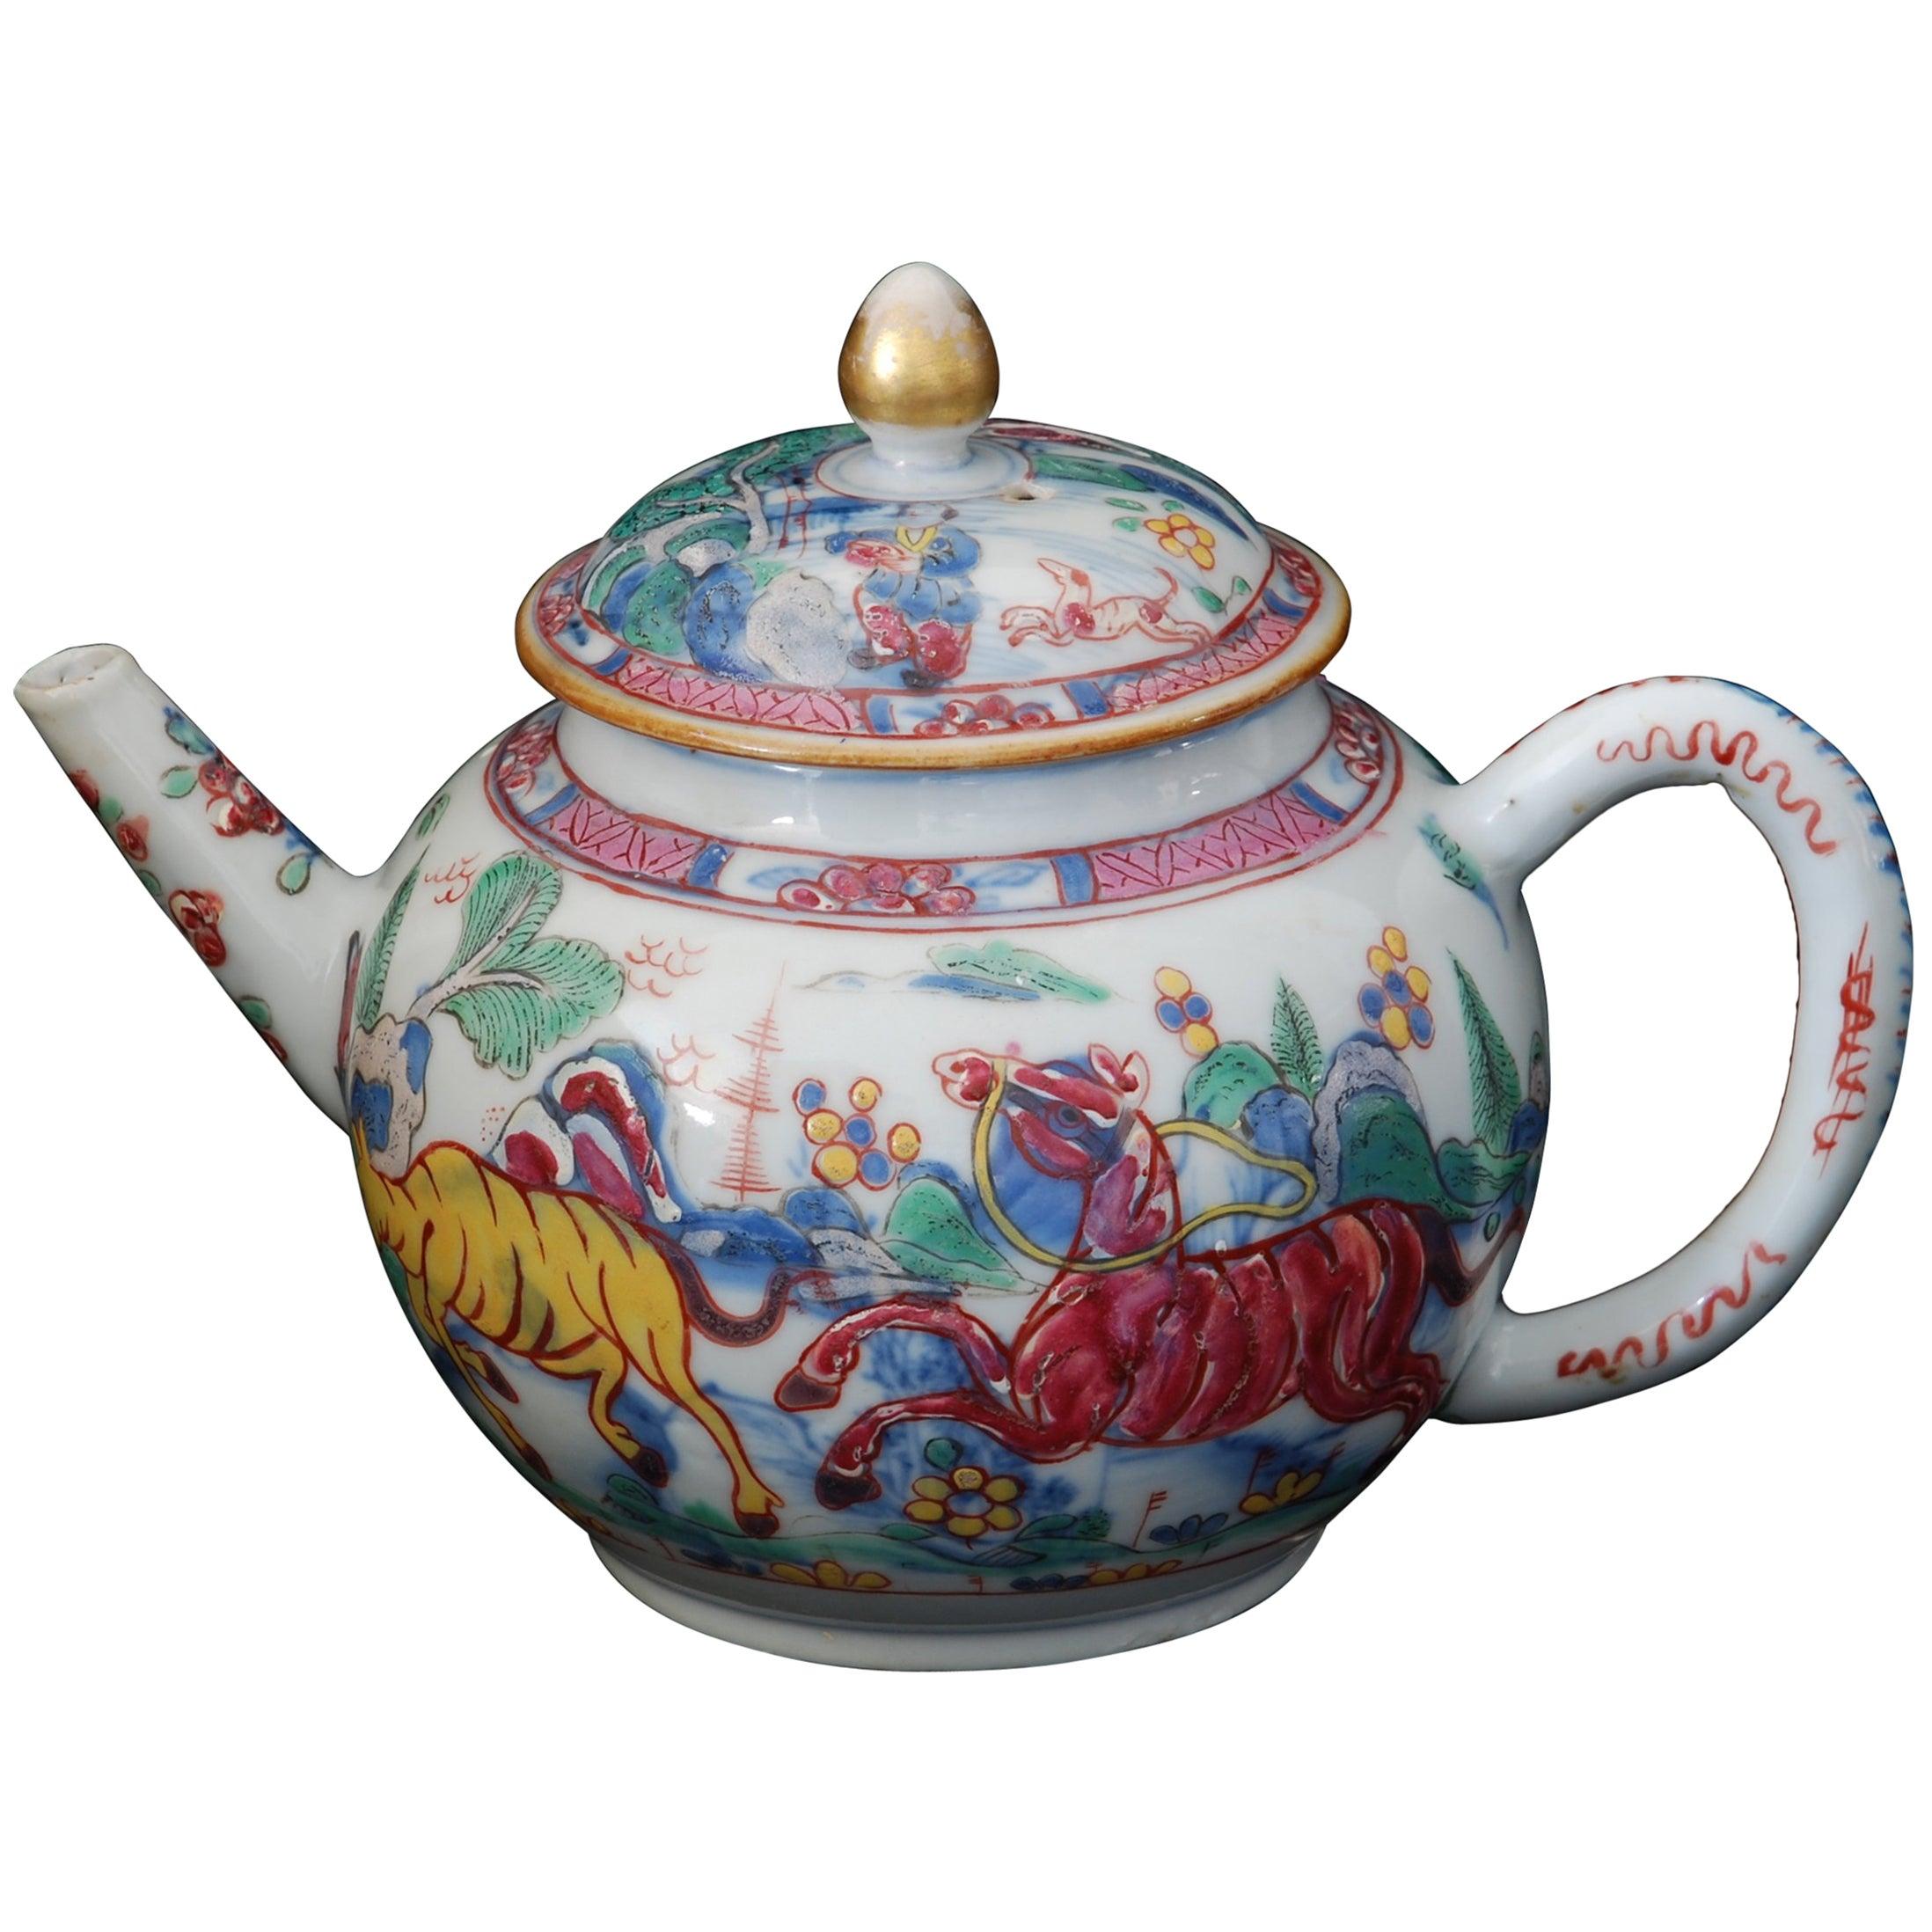 Teapot, Prancing Ponies, China, circa 1760, Decorated in London